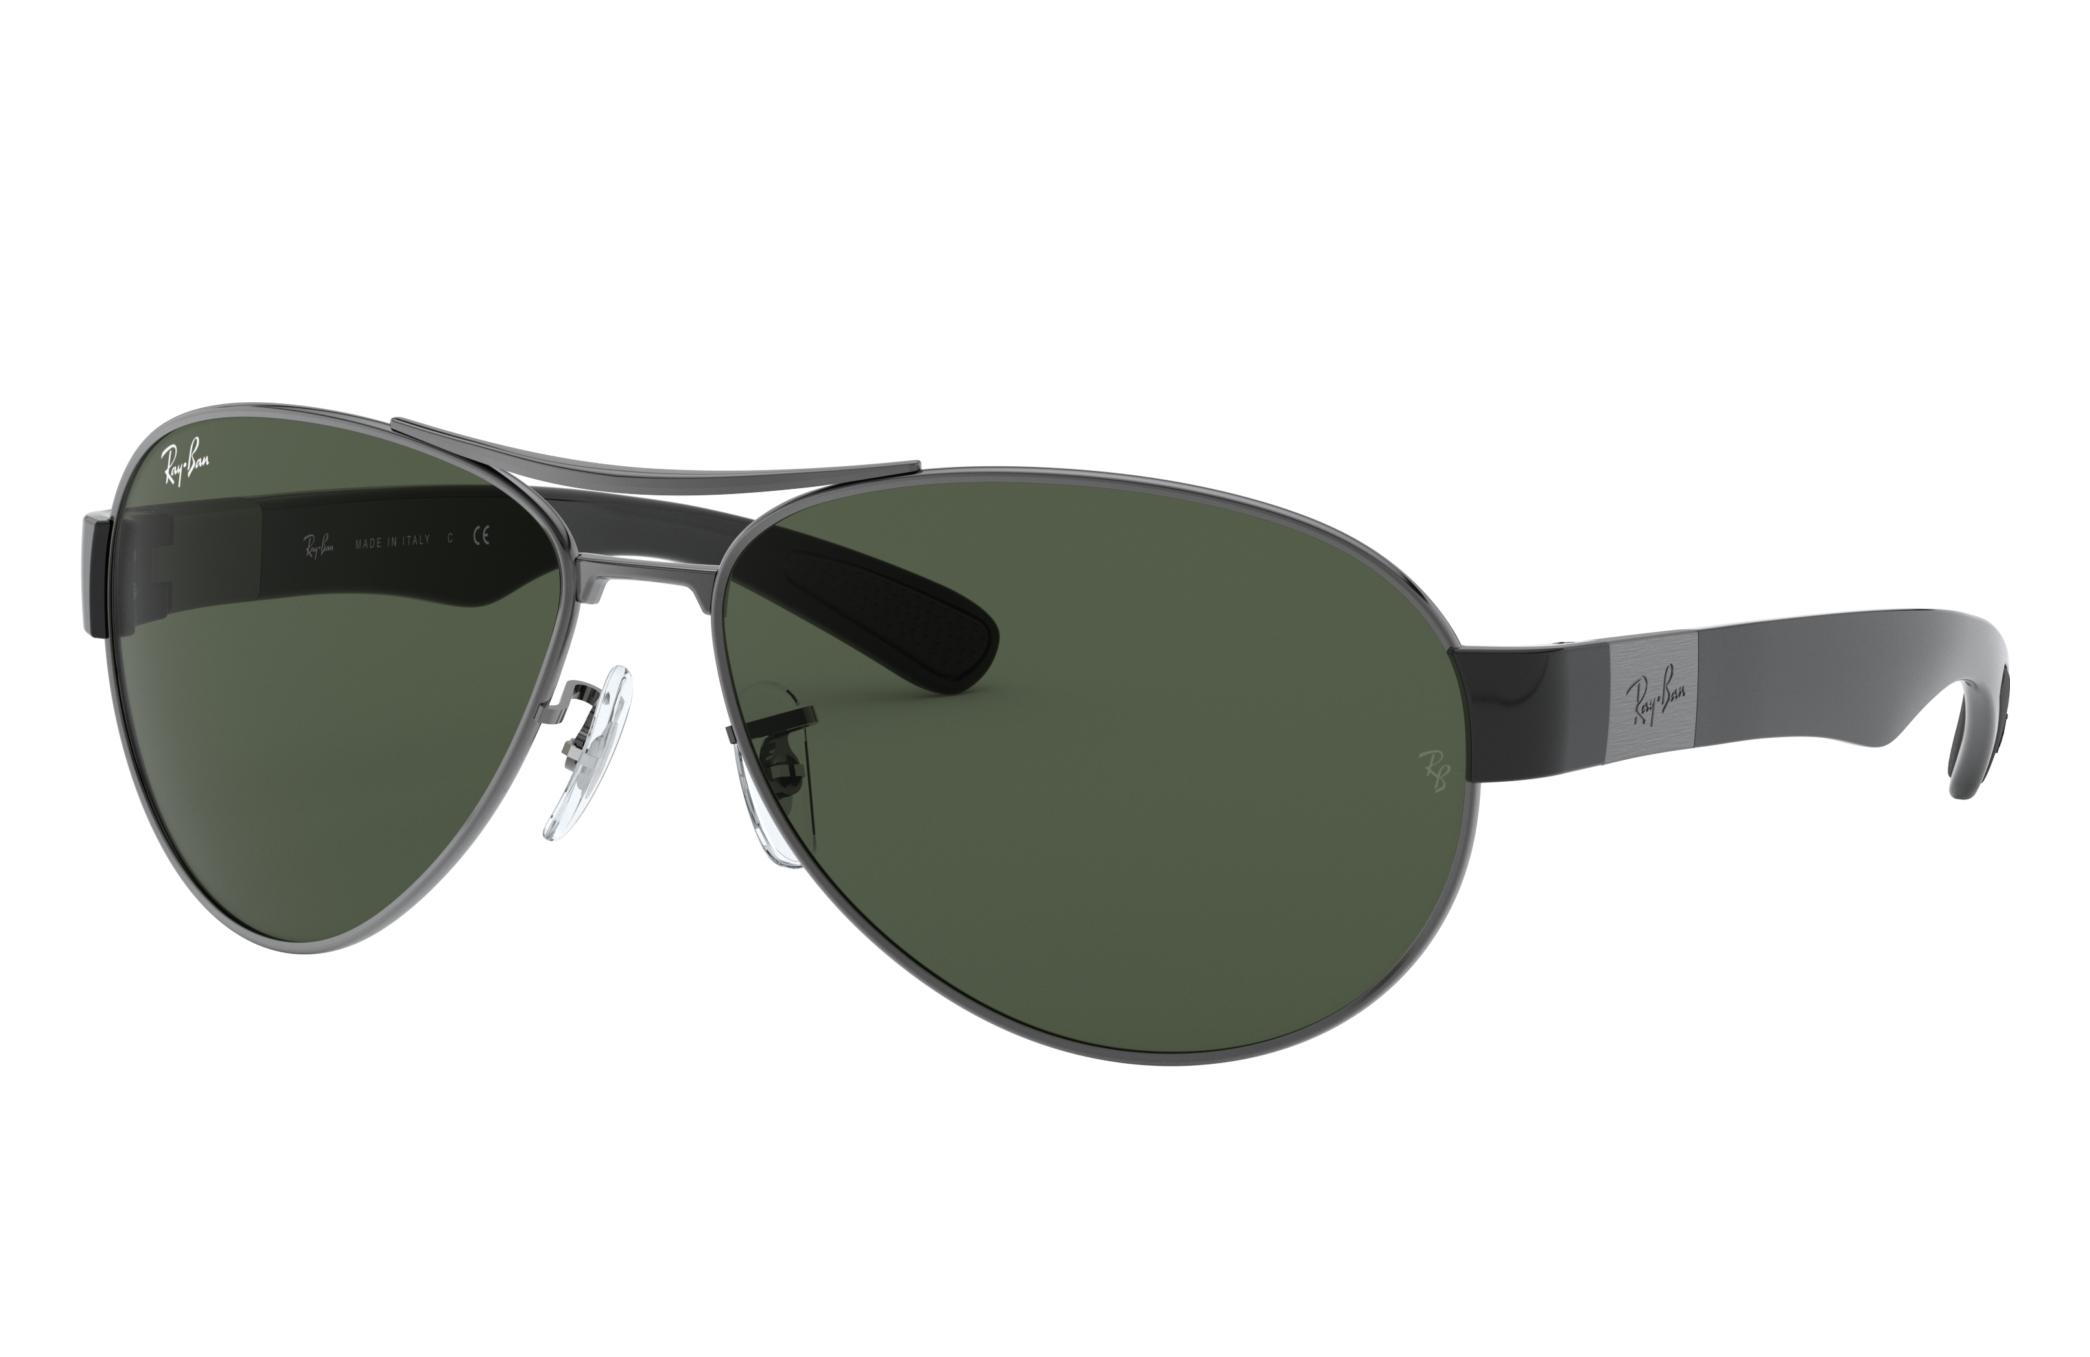 Ray-Ban Rb3509 Black, Green Lenses - RB3509